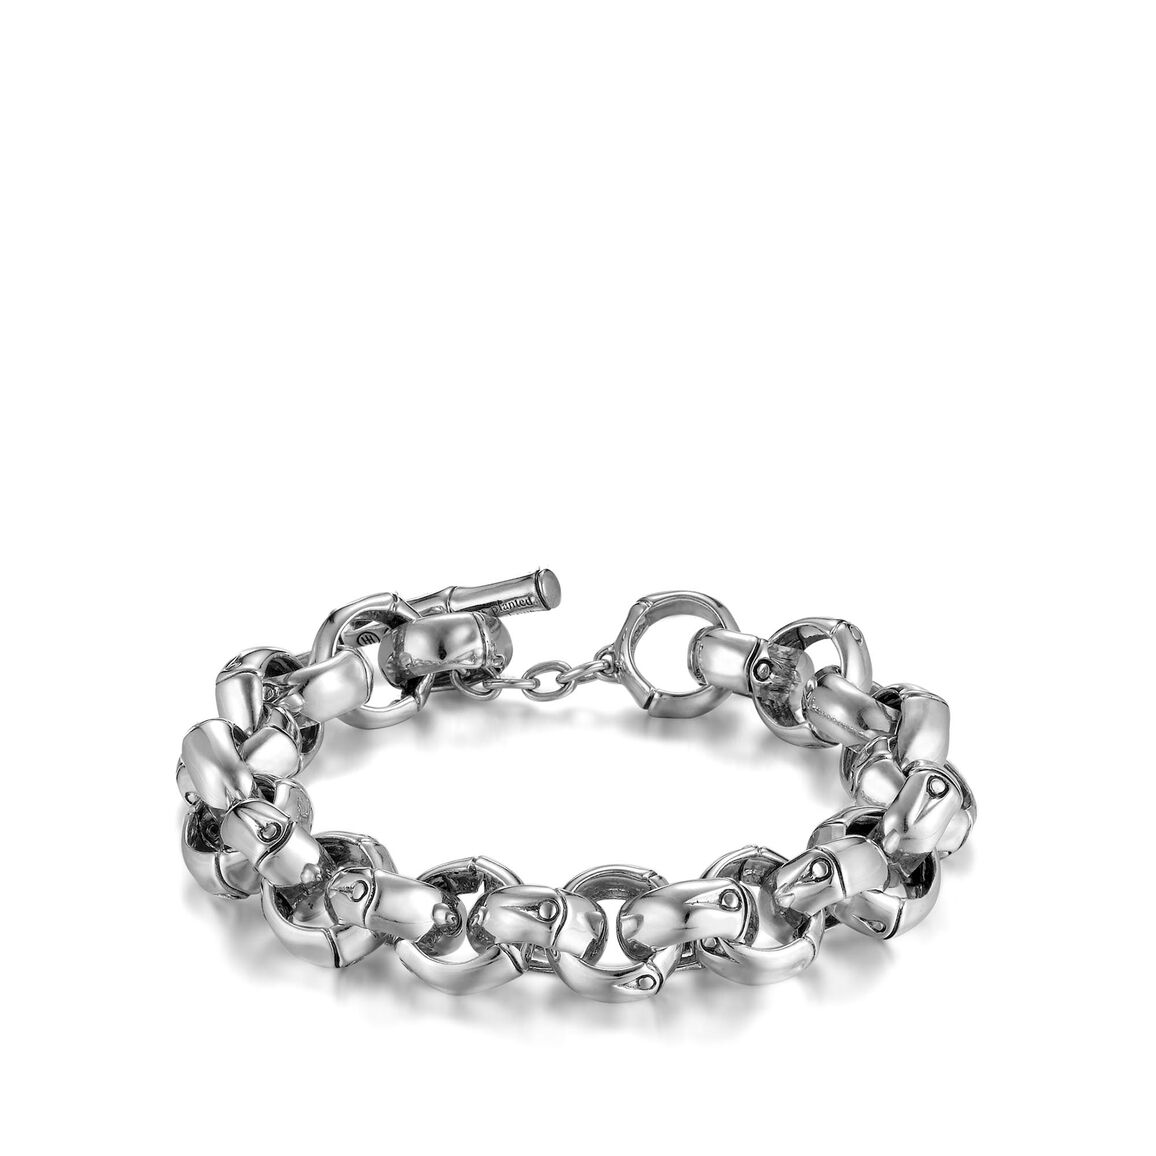 Bamboo 13MM Link Bracelet in Silver